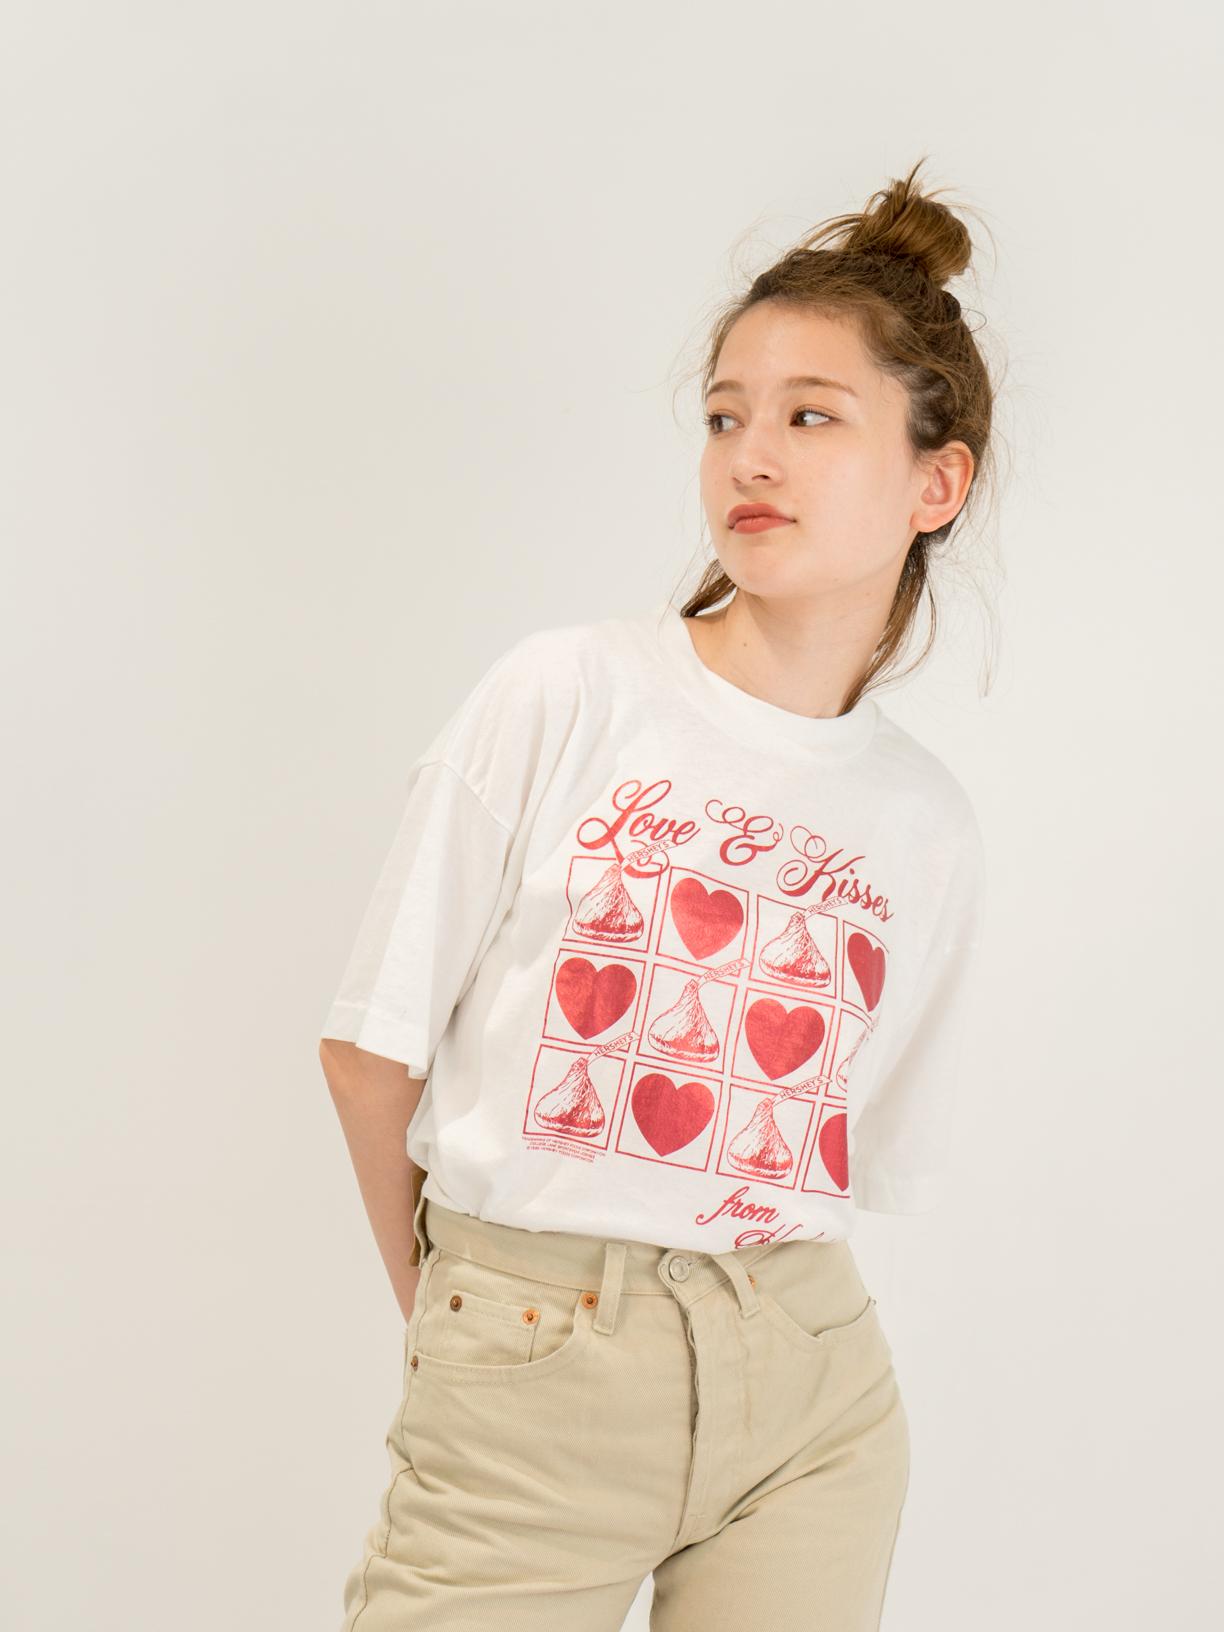 ◼︎'90 KISS CHOCOLATE metallic heart T-shirts from U.S.A.◼︎